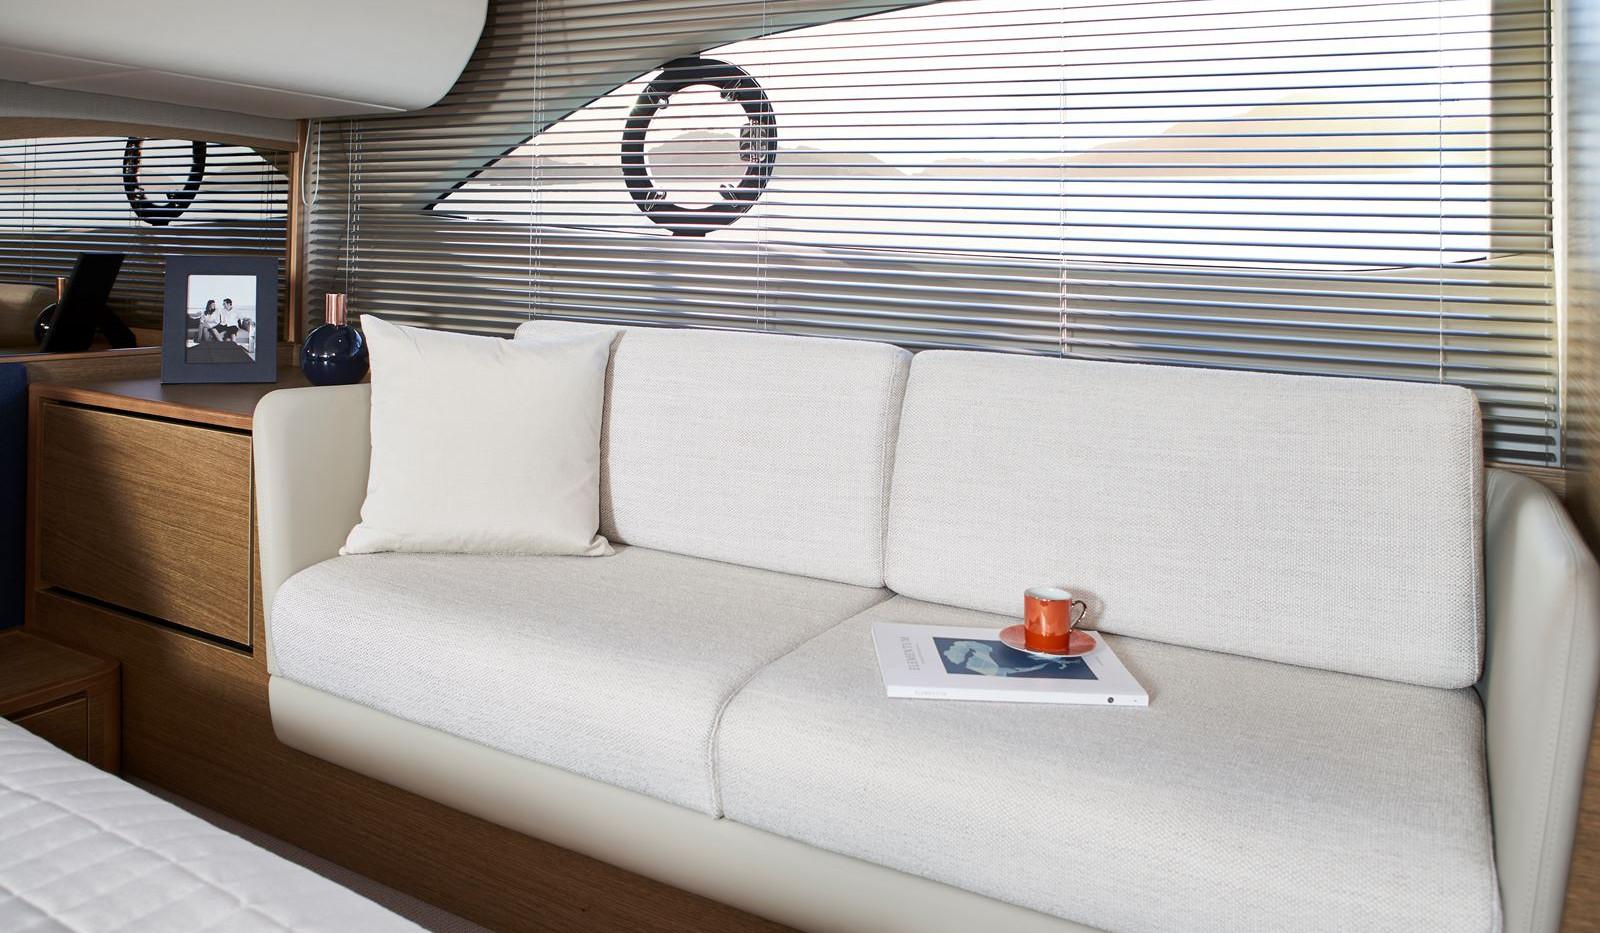 princess-f45-master-cabin-detail-1-rt.jp